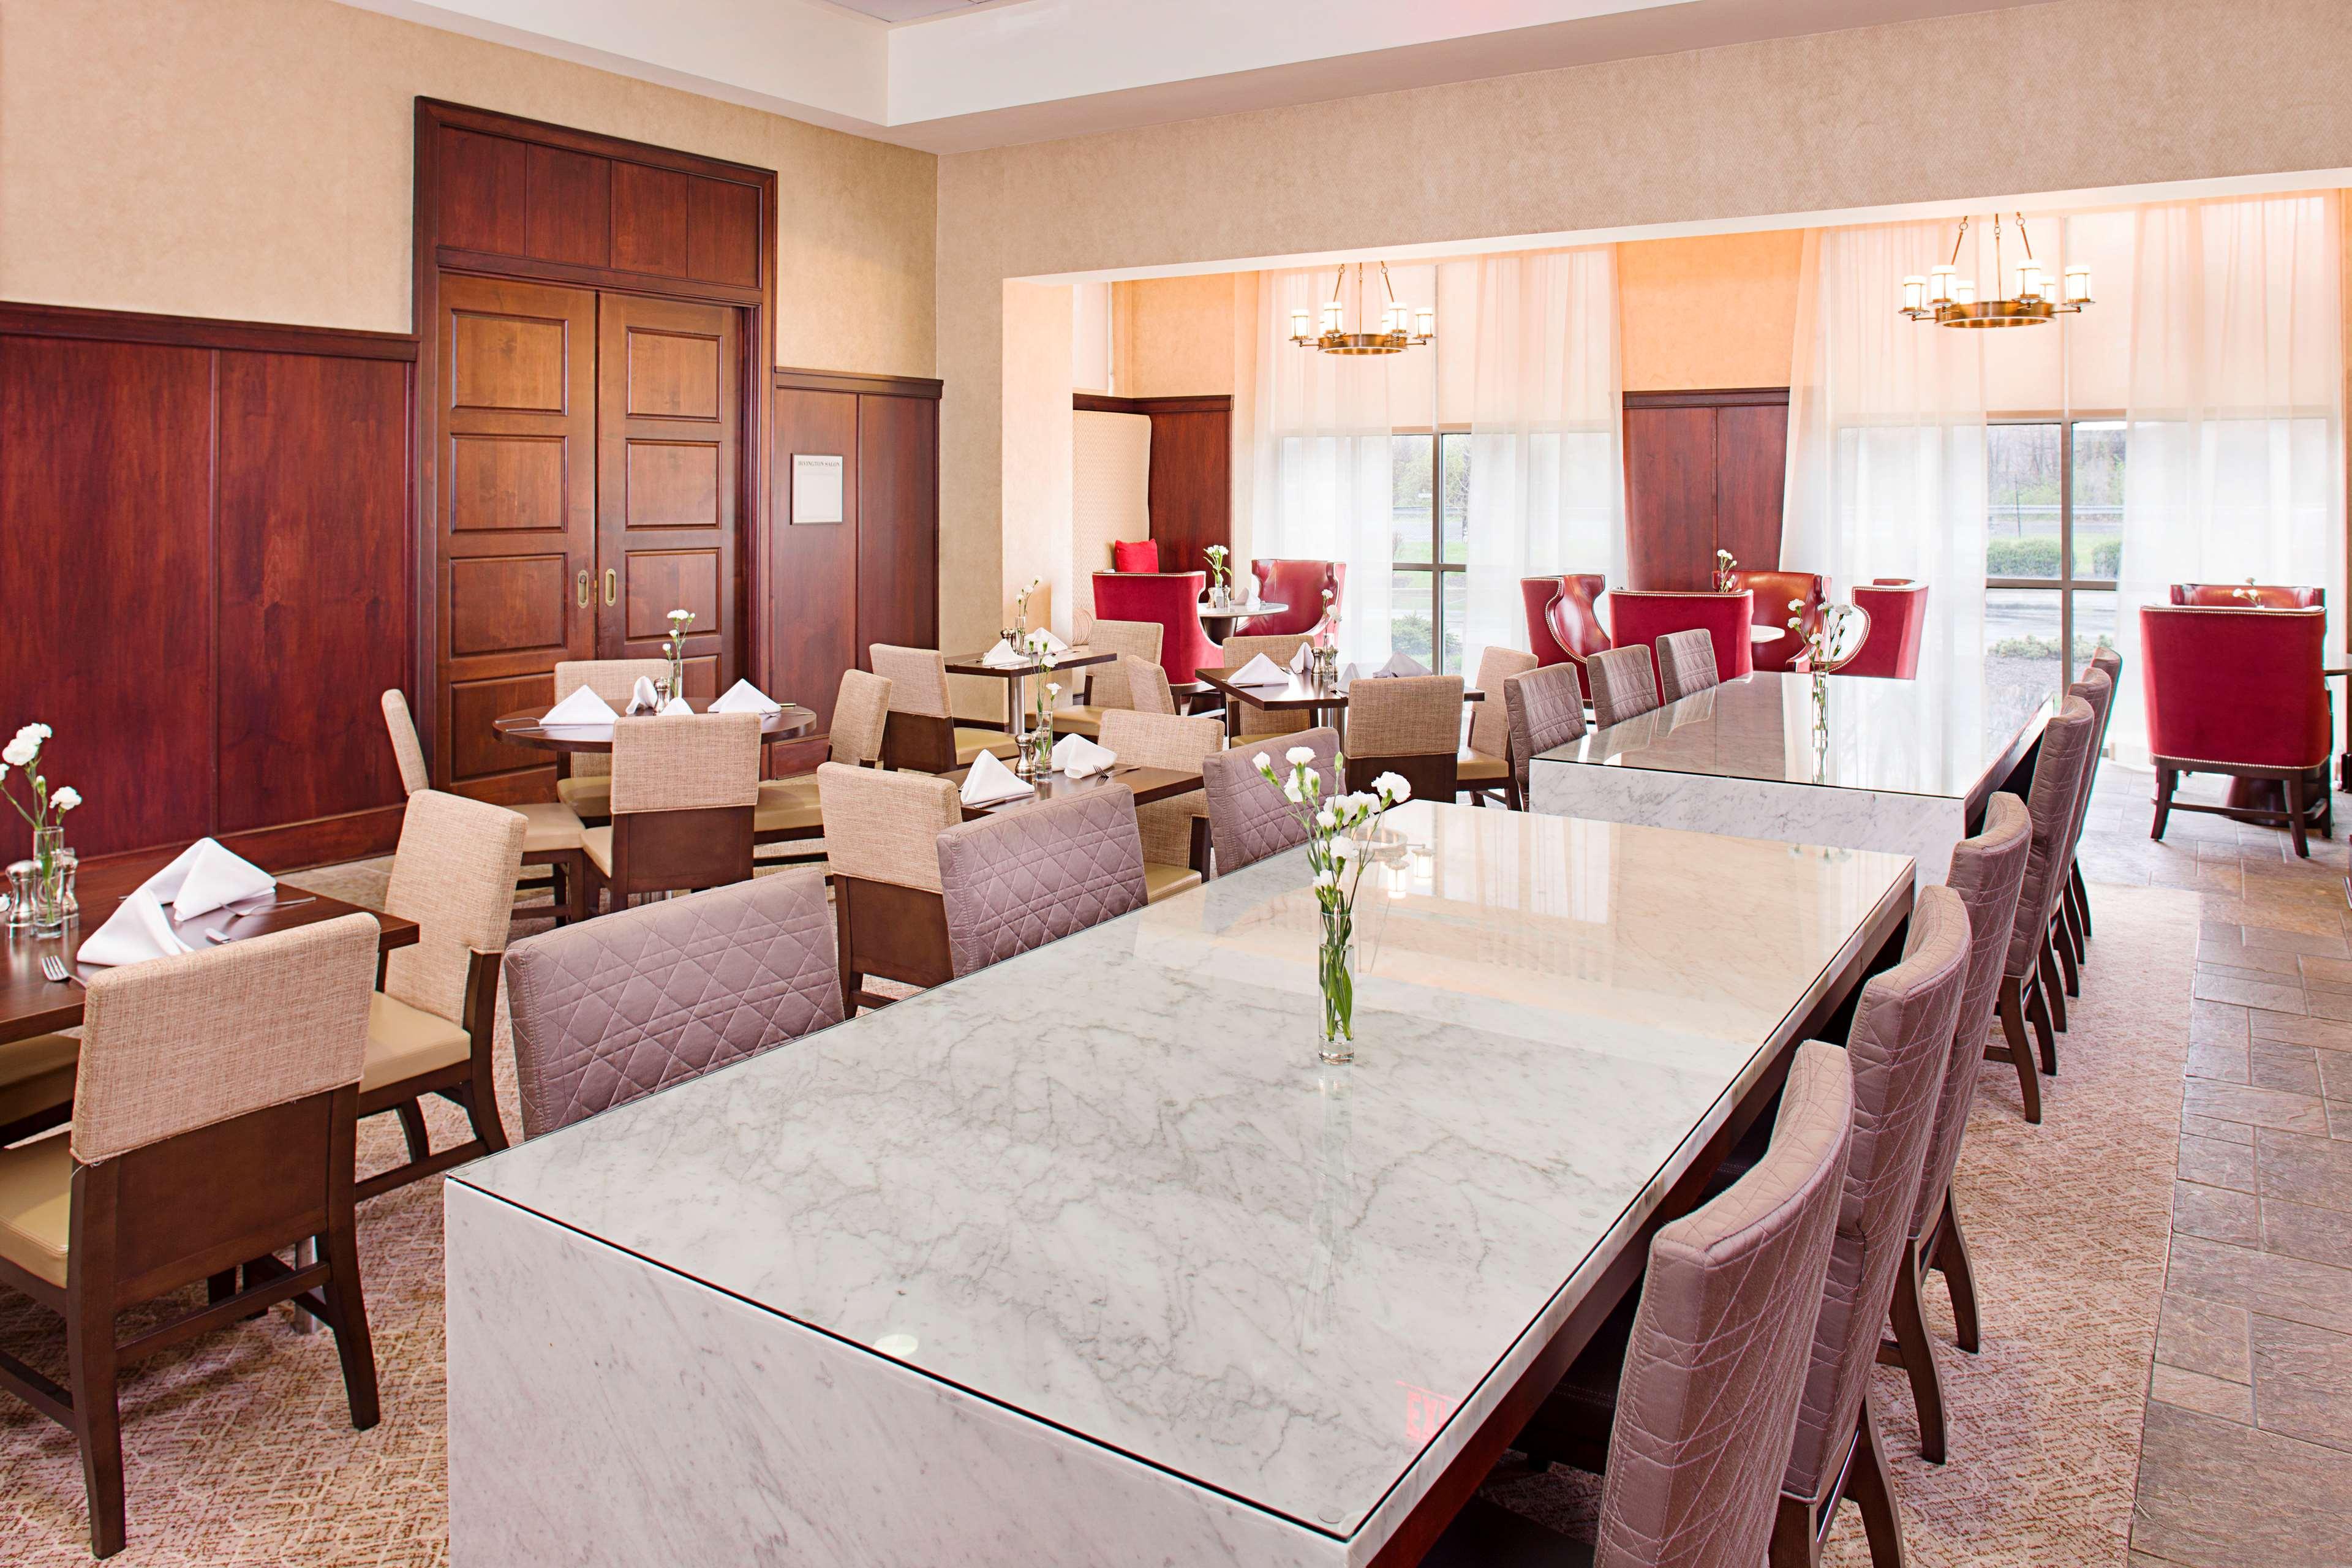 Sheraton Rockville Hotel image 4